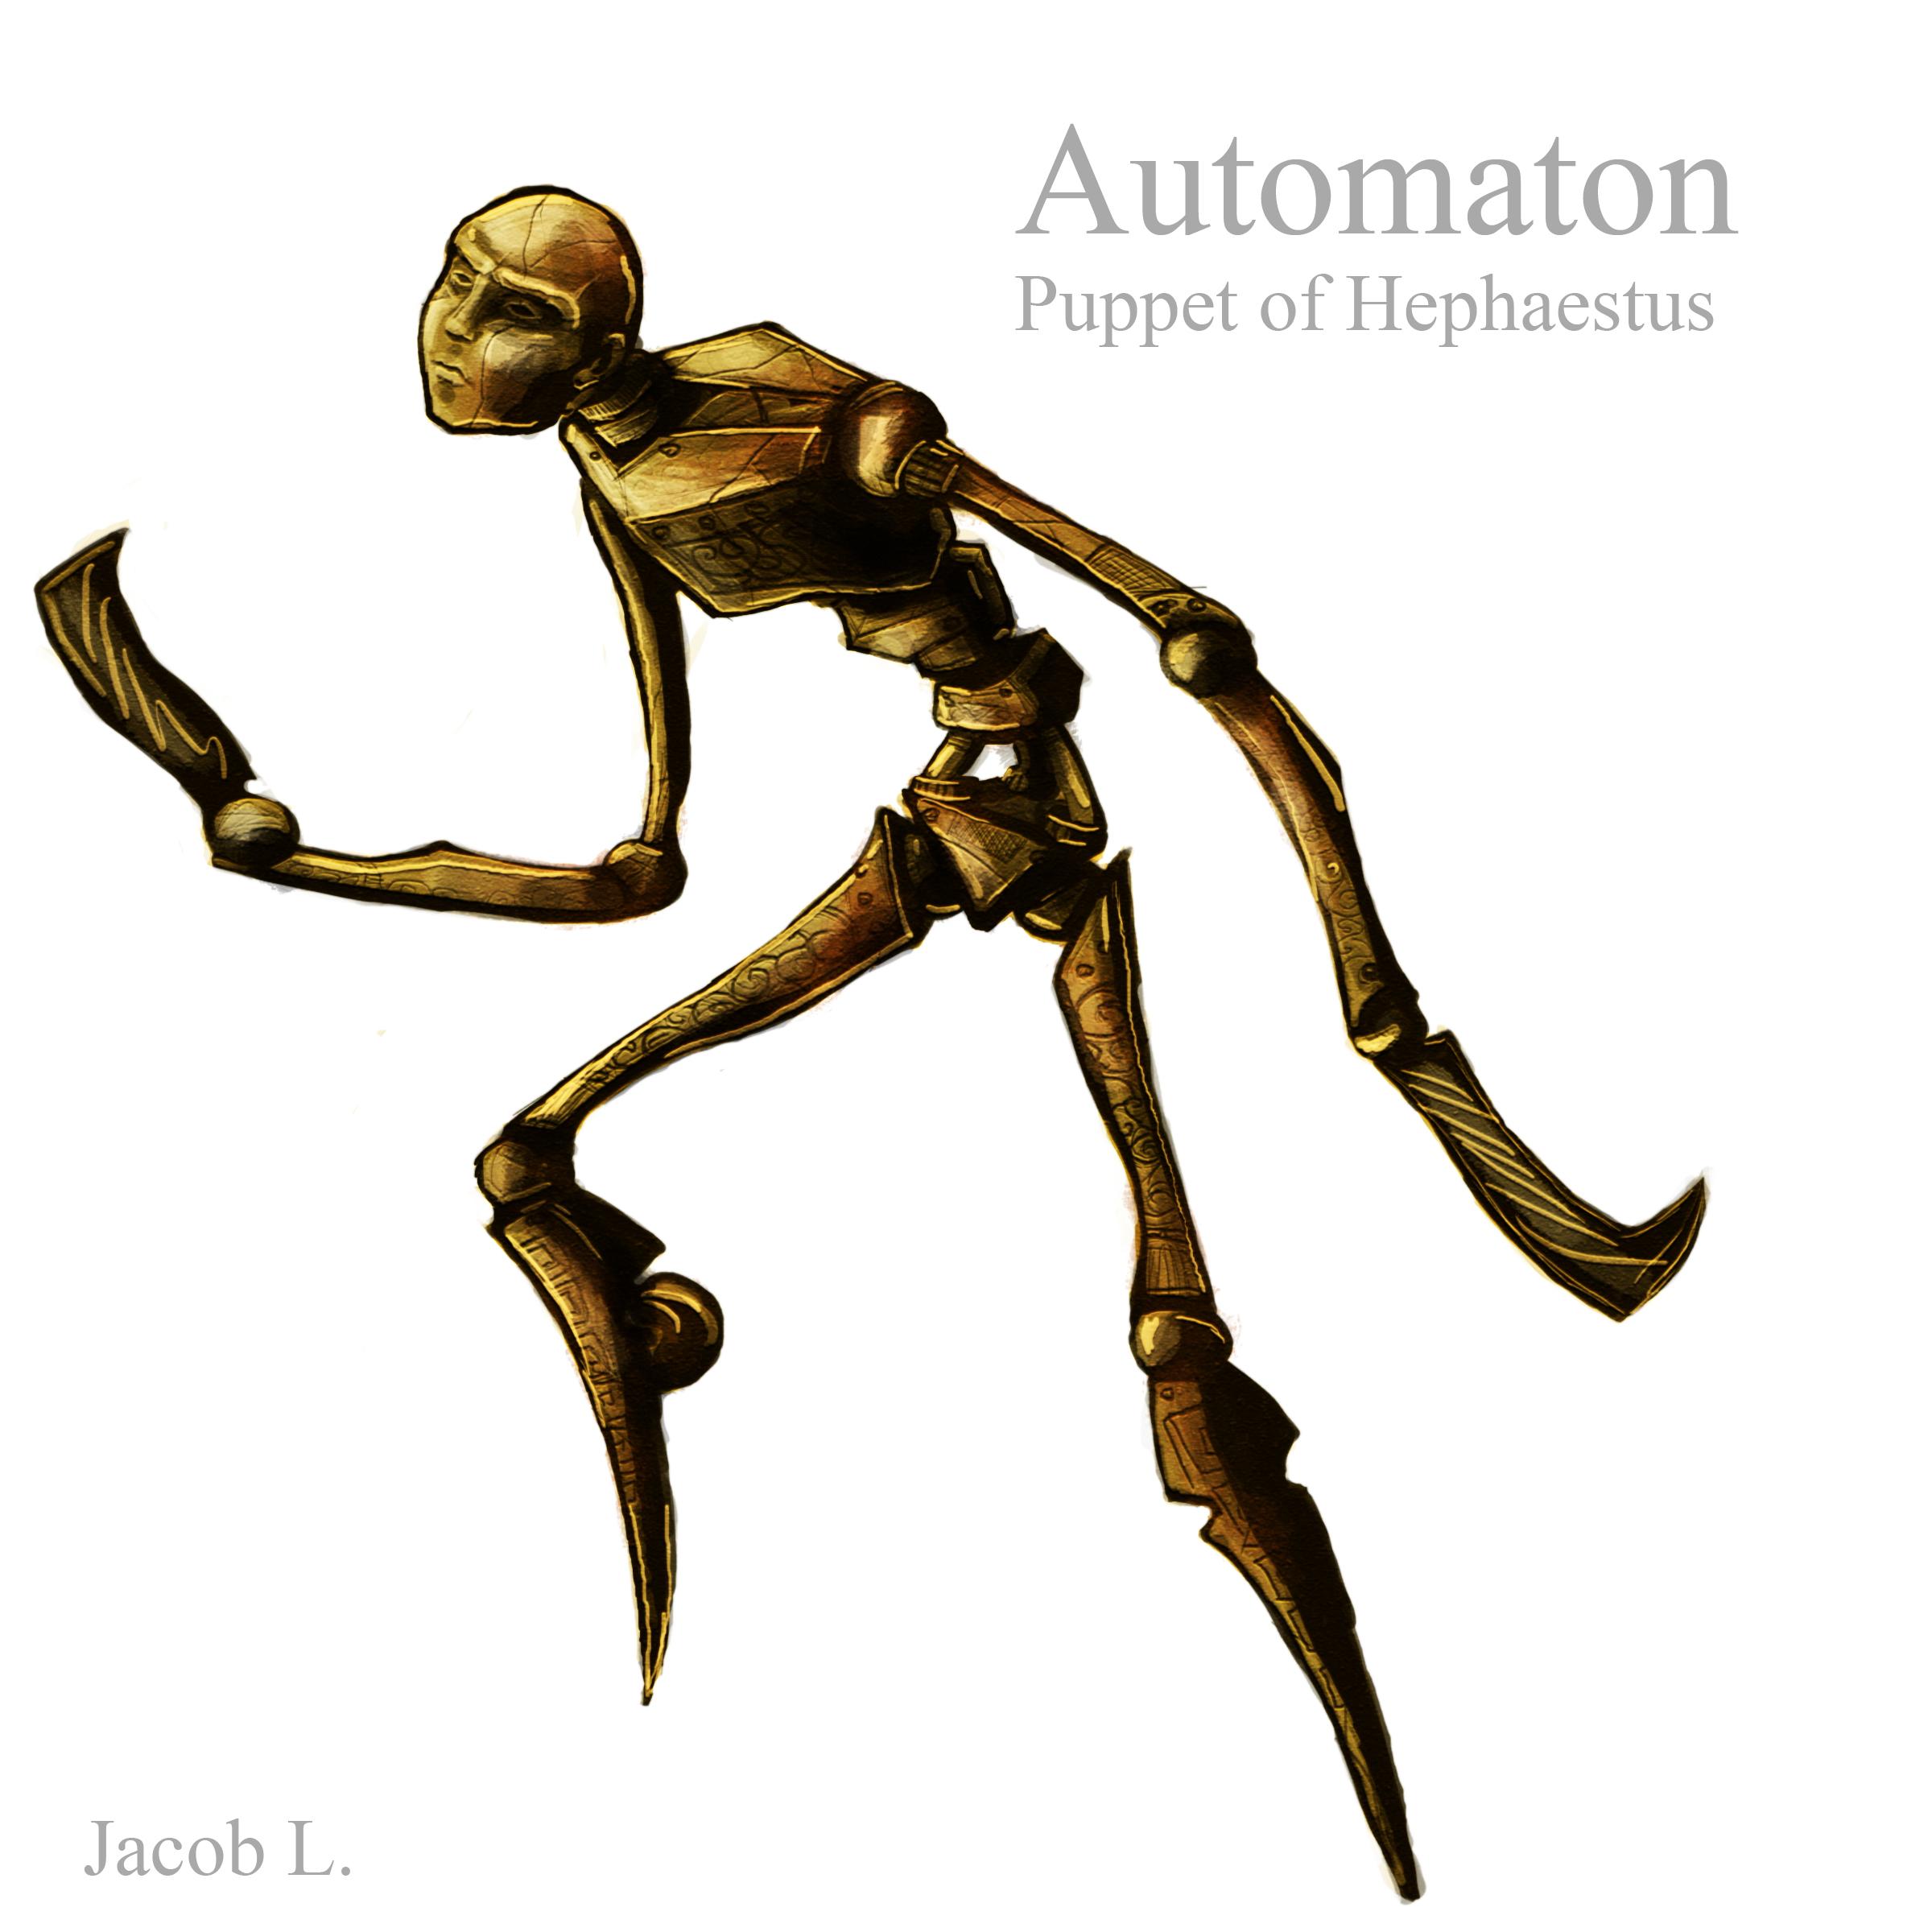 Automaton_1_jacob.jpg